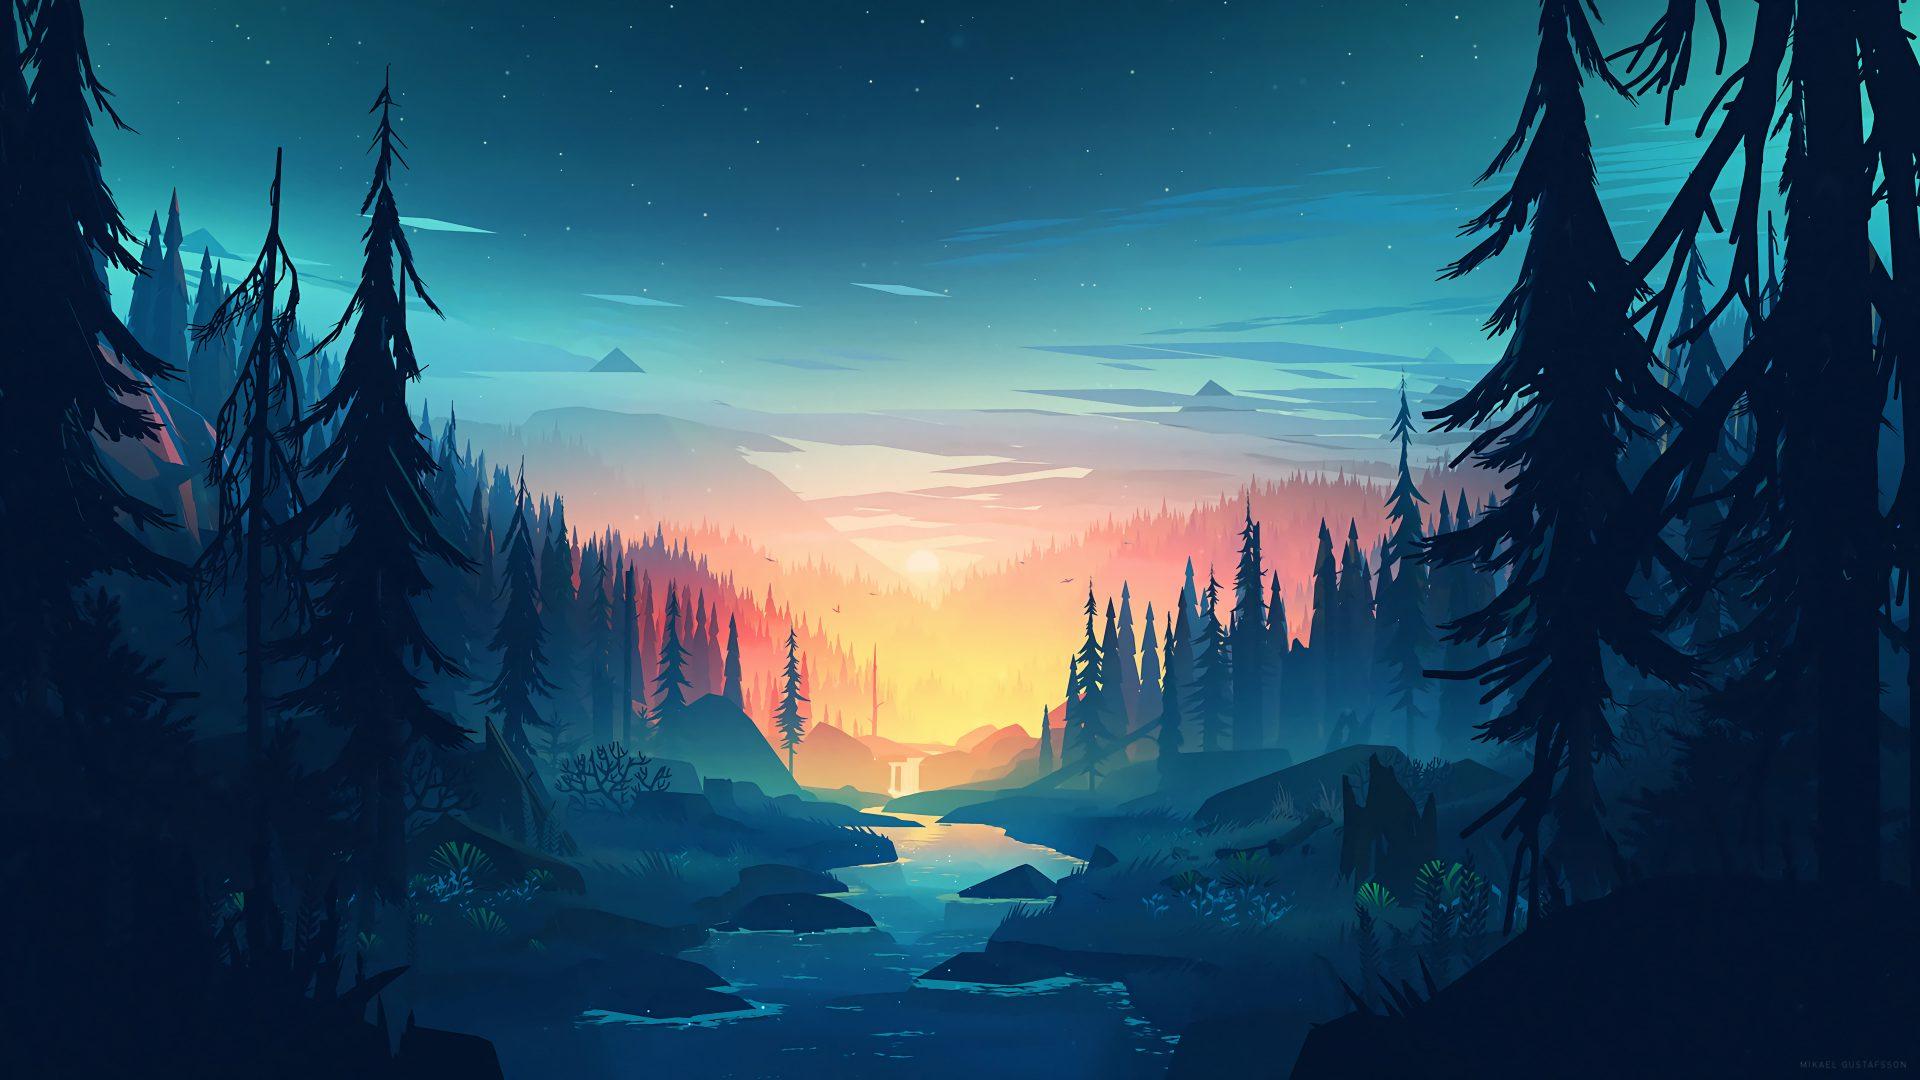 Minimal Minimalist Nature Sunrise River 8k Wallpaper Best Wallpapers